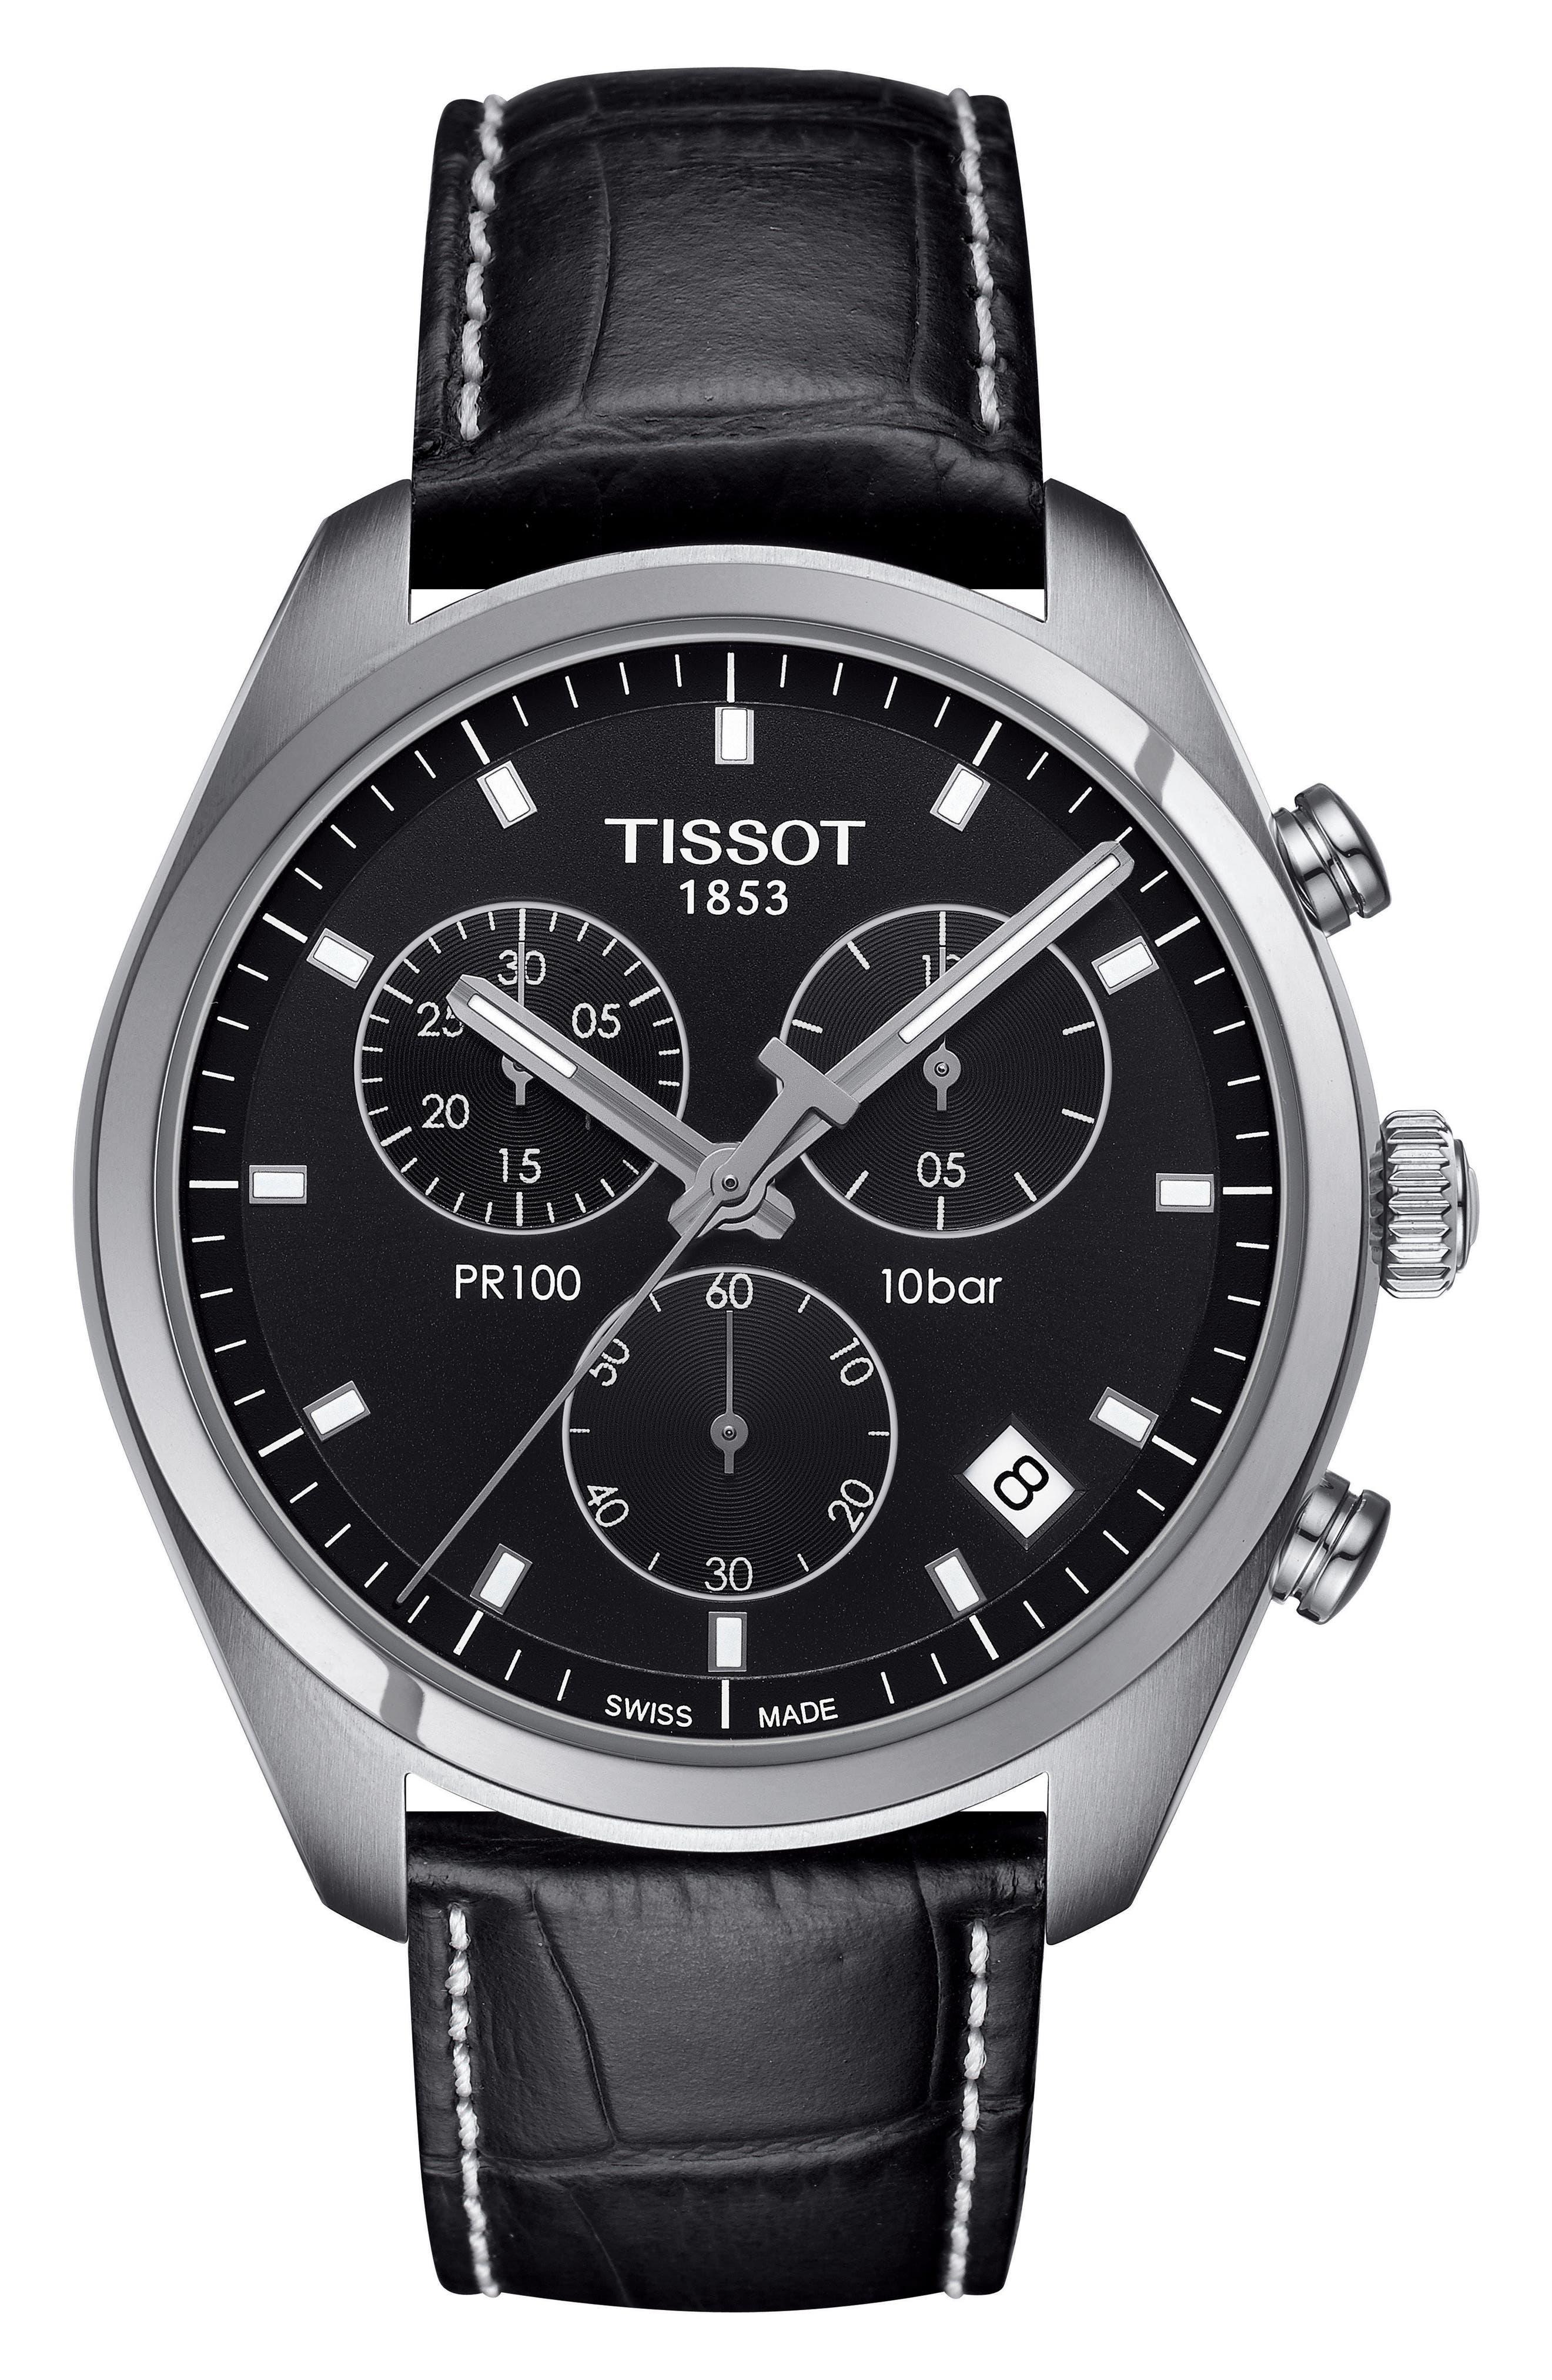 Main Image - Tissot PR100 Chronograph Leather Strap Watch, 41mm